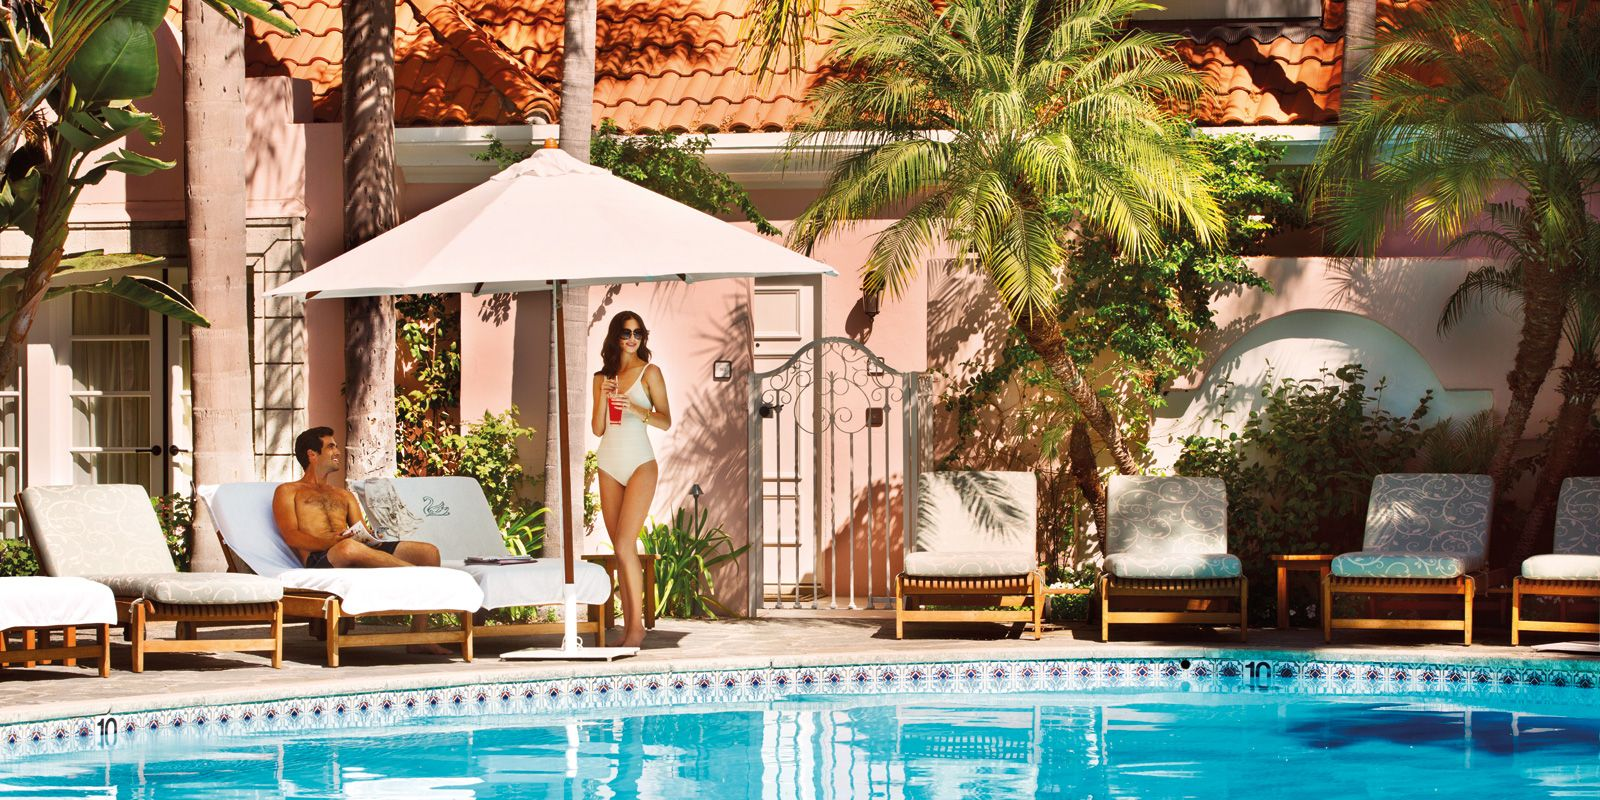 Hotel Bel-air - 5-star Luxury Stockists